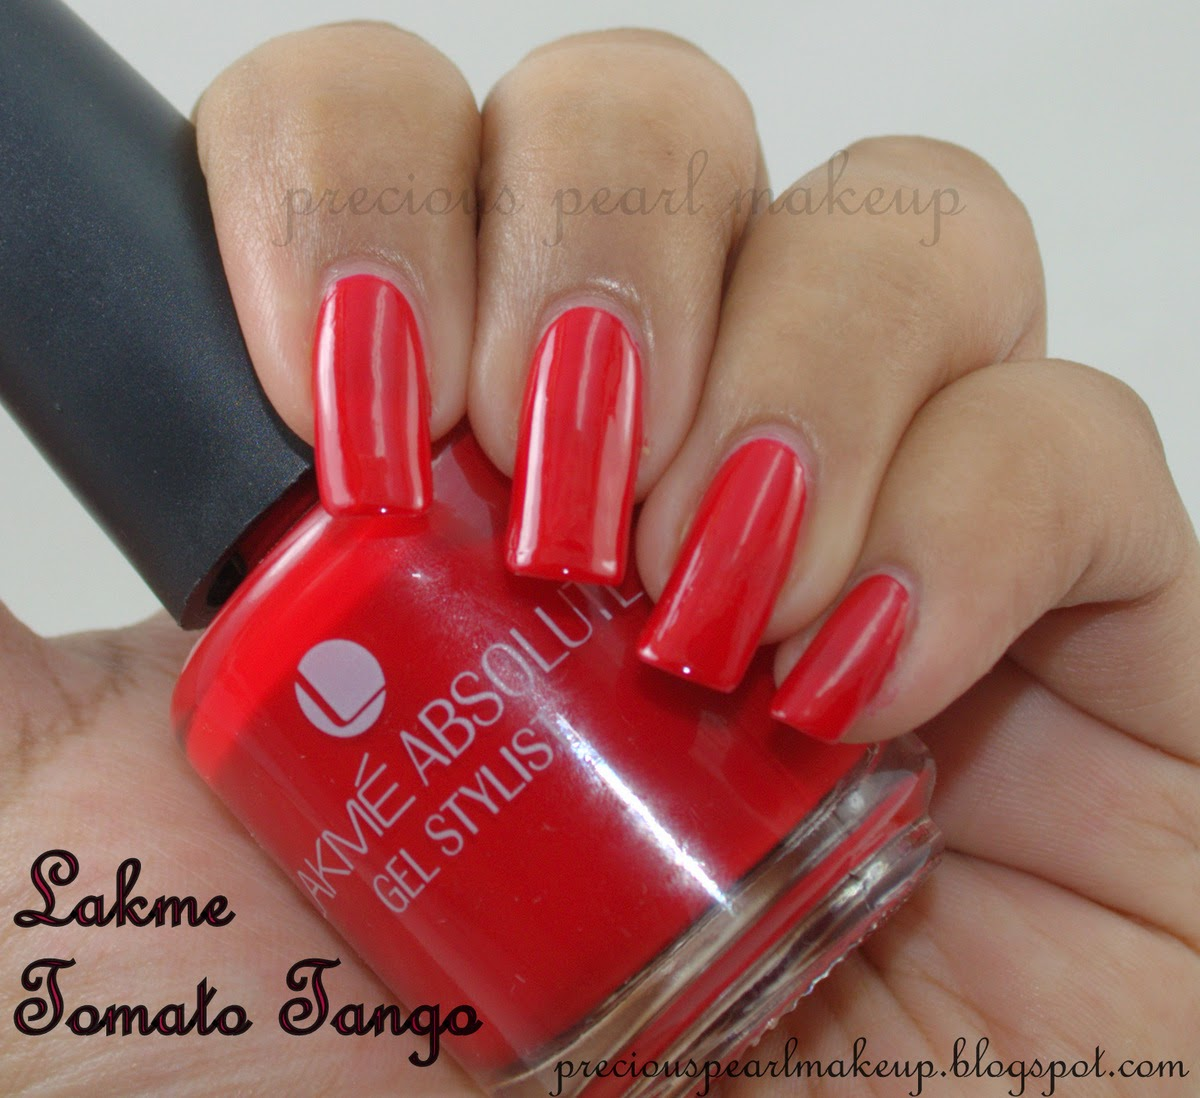 Gel Nail Polish Lakme: Preciouspearlmakeup: Lakme Absolute Gel Stylist Tomato Tango